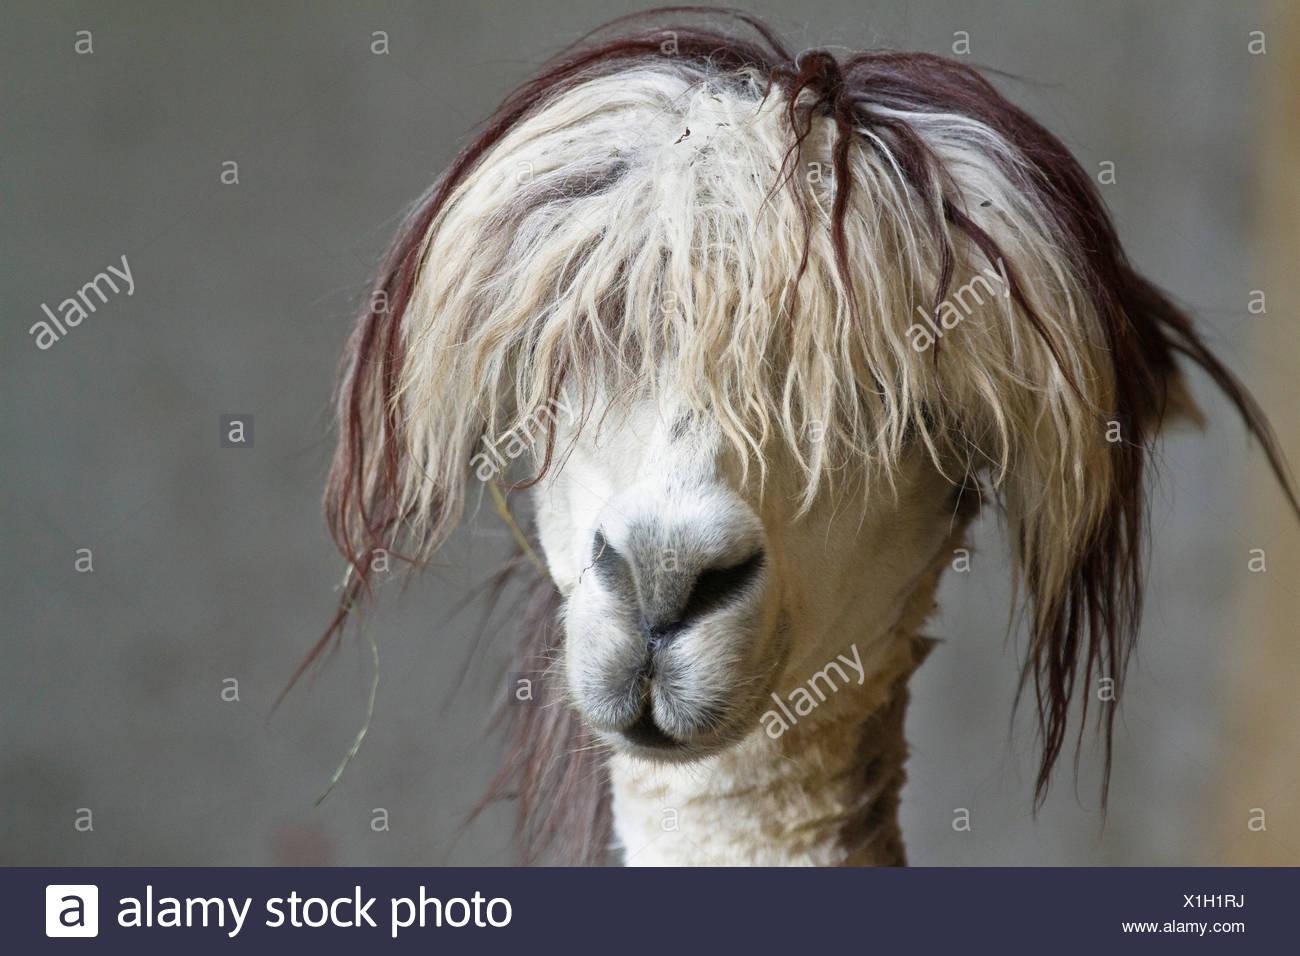 Lustige Frisur Stockfotos Lustige Frisur Bilder Alamy